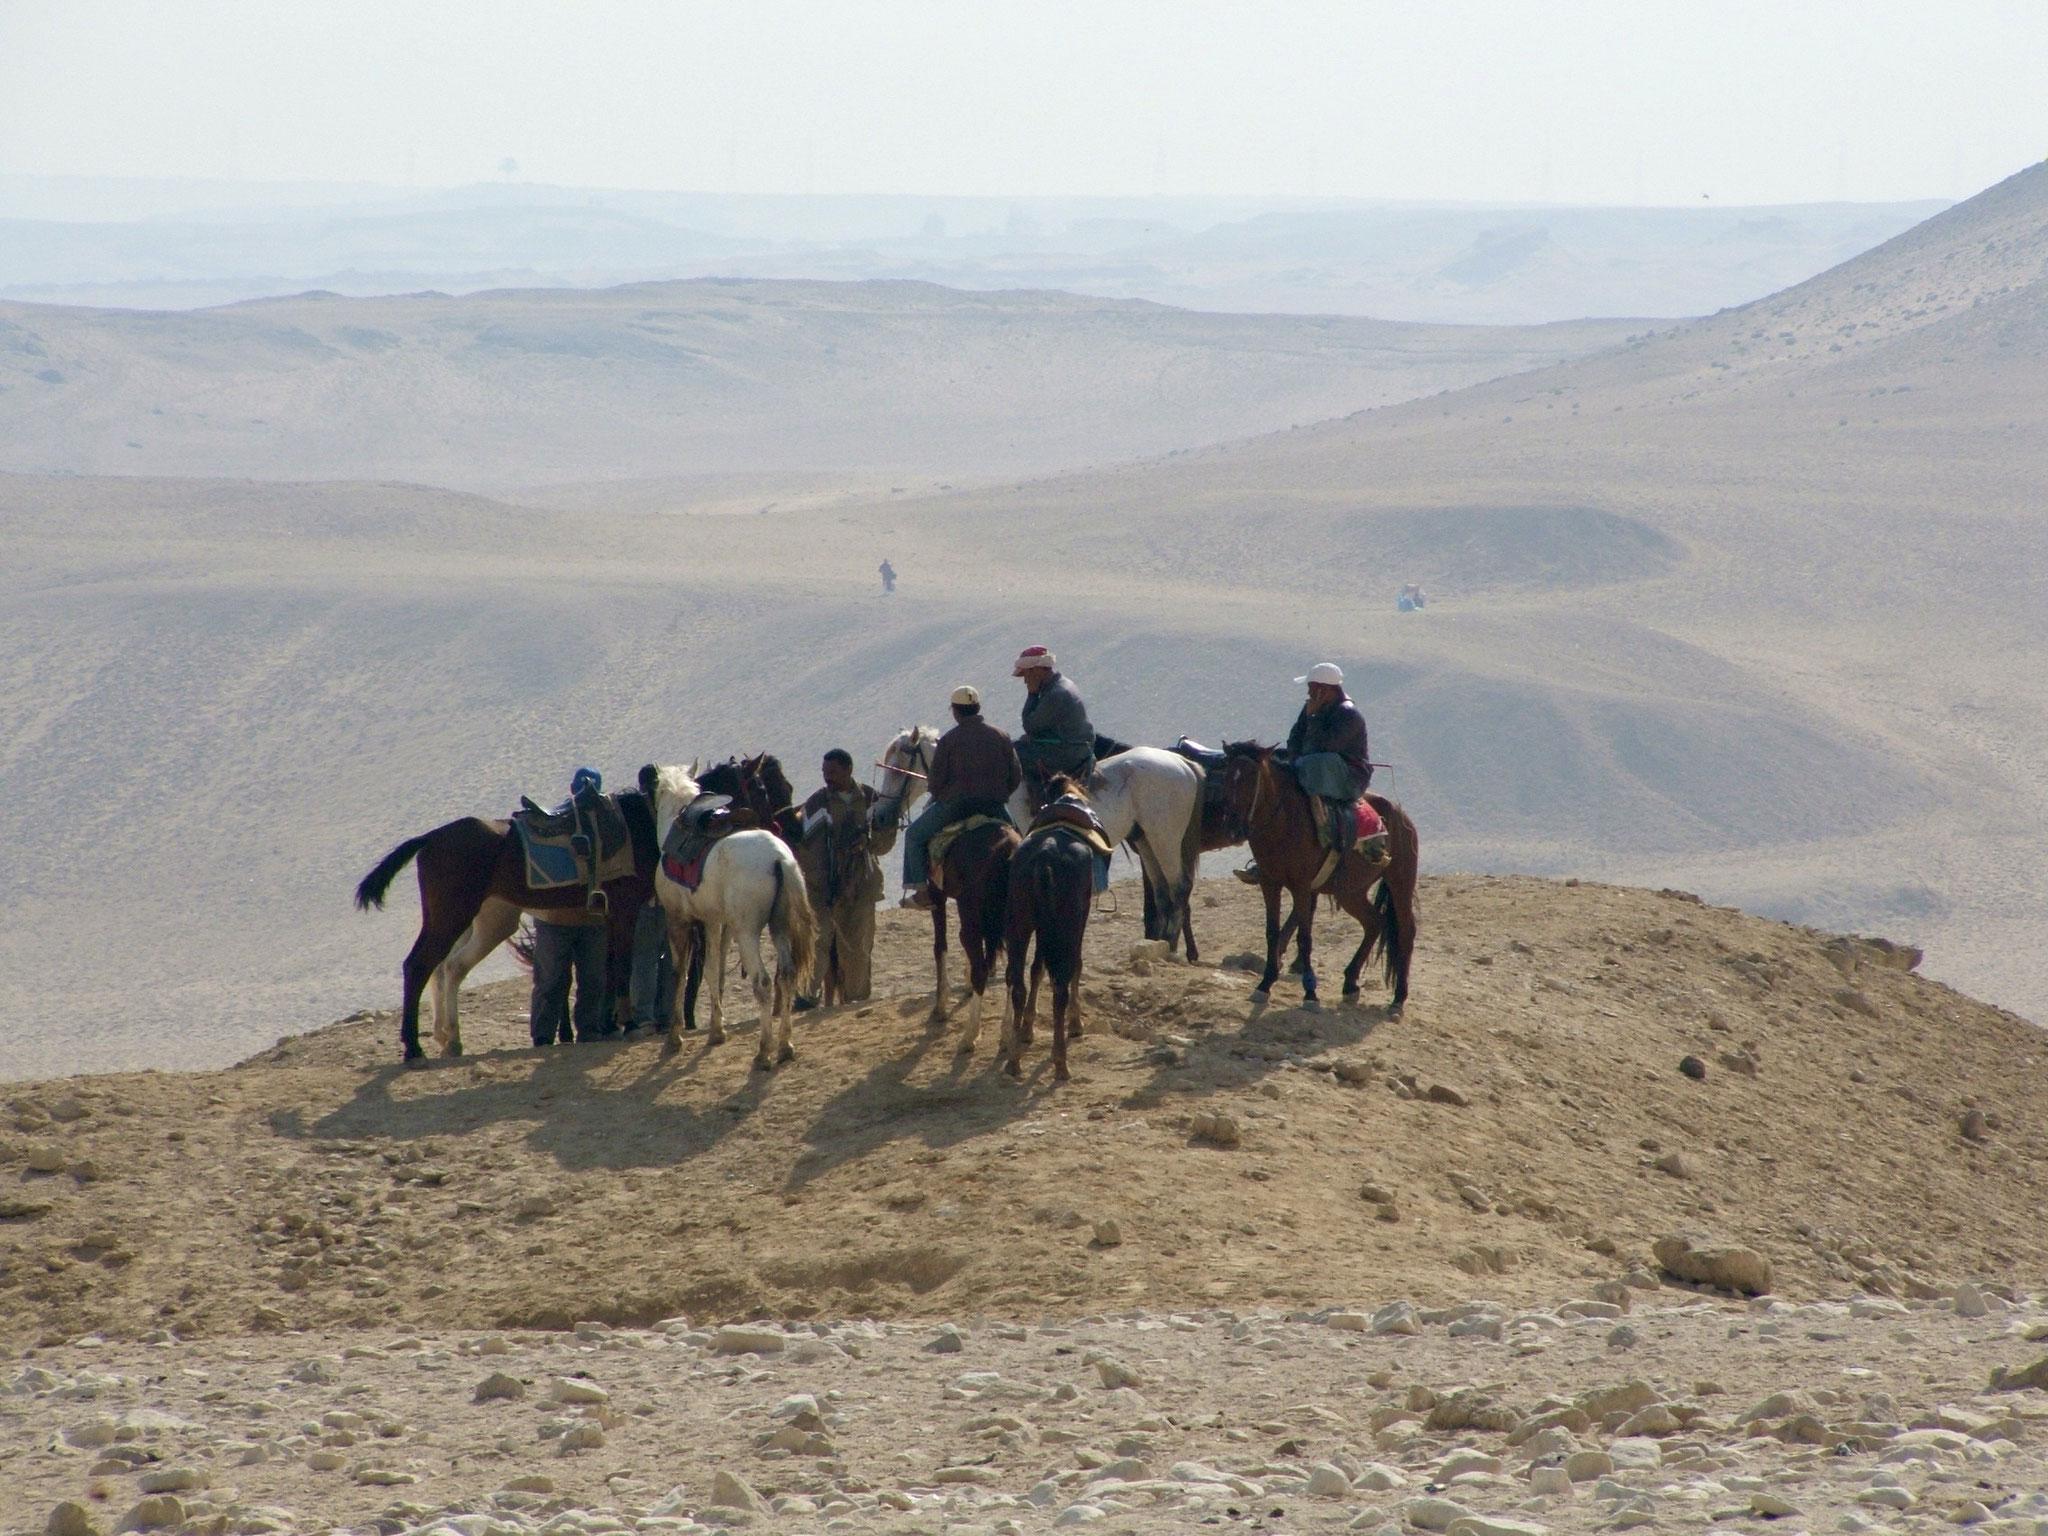 Hilltop rendezvous, Giza